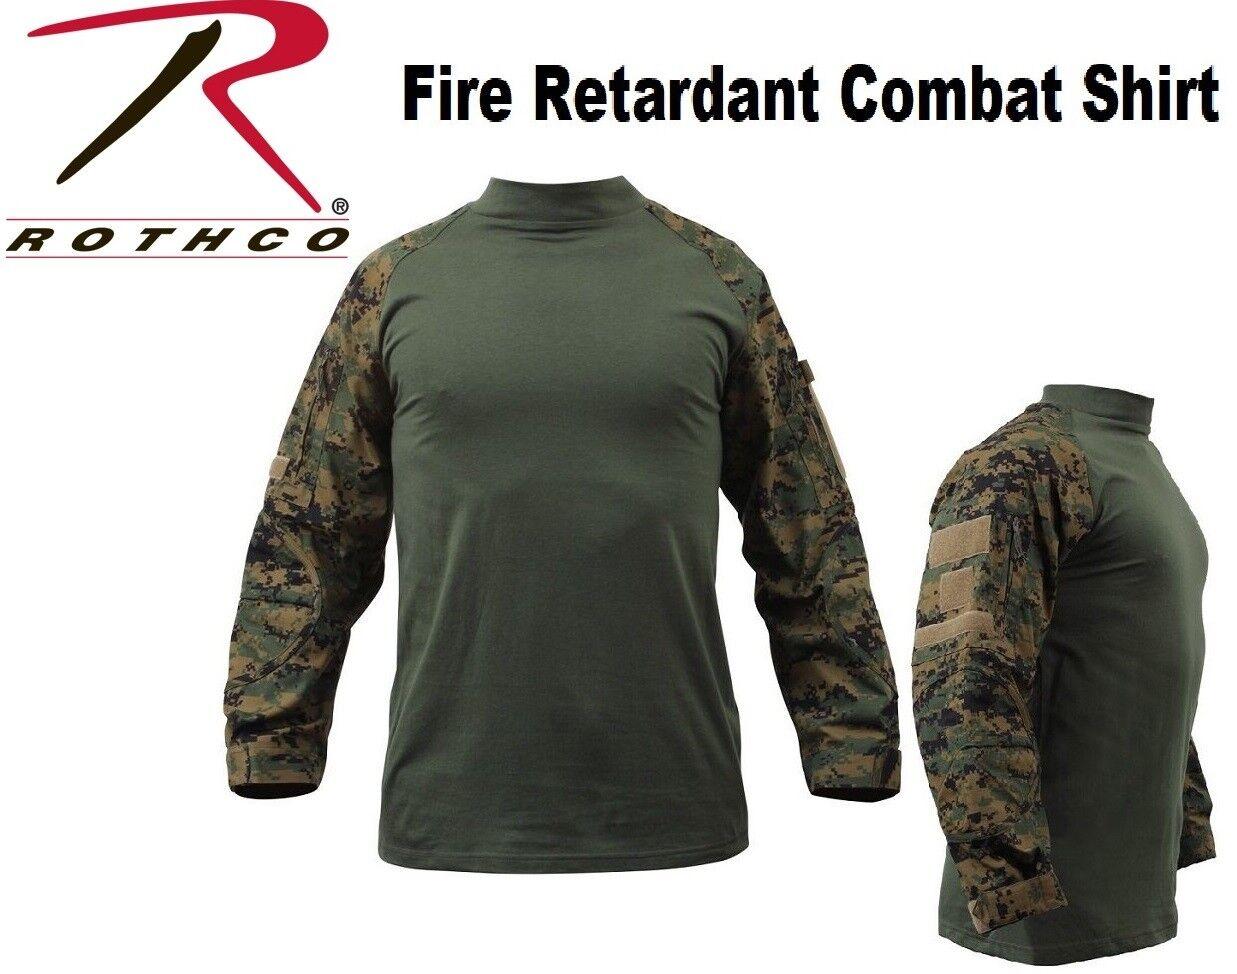 USMC Woodland Digital Camo Fire Retard Lightweight Tactical Combat Shirt 90005